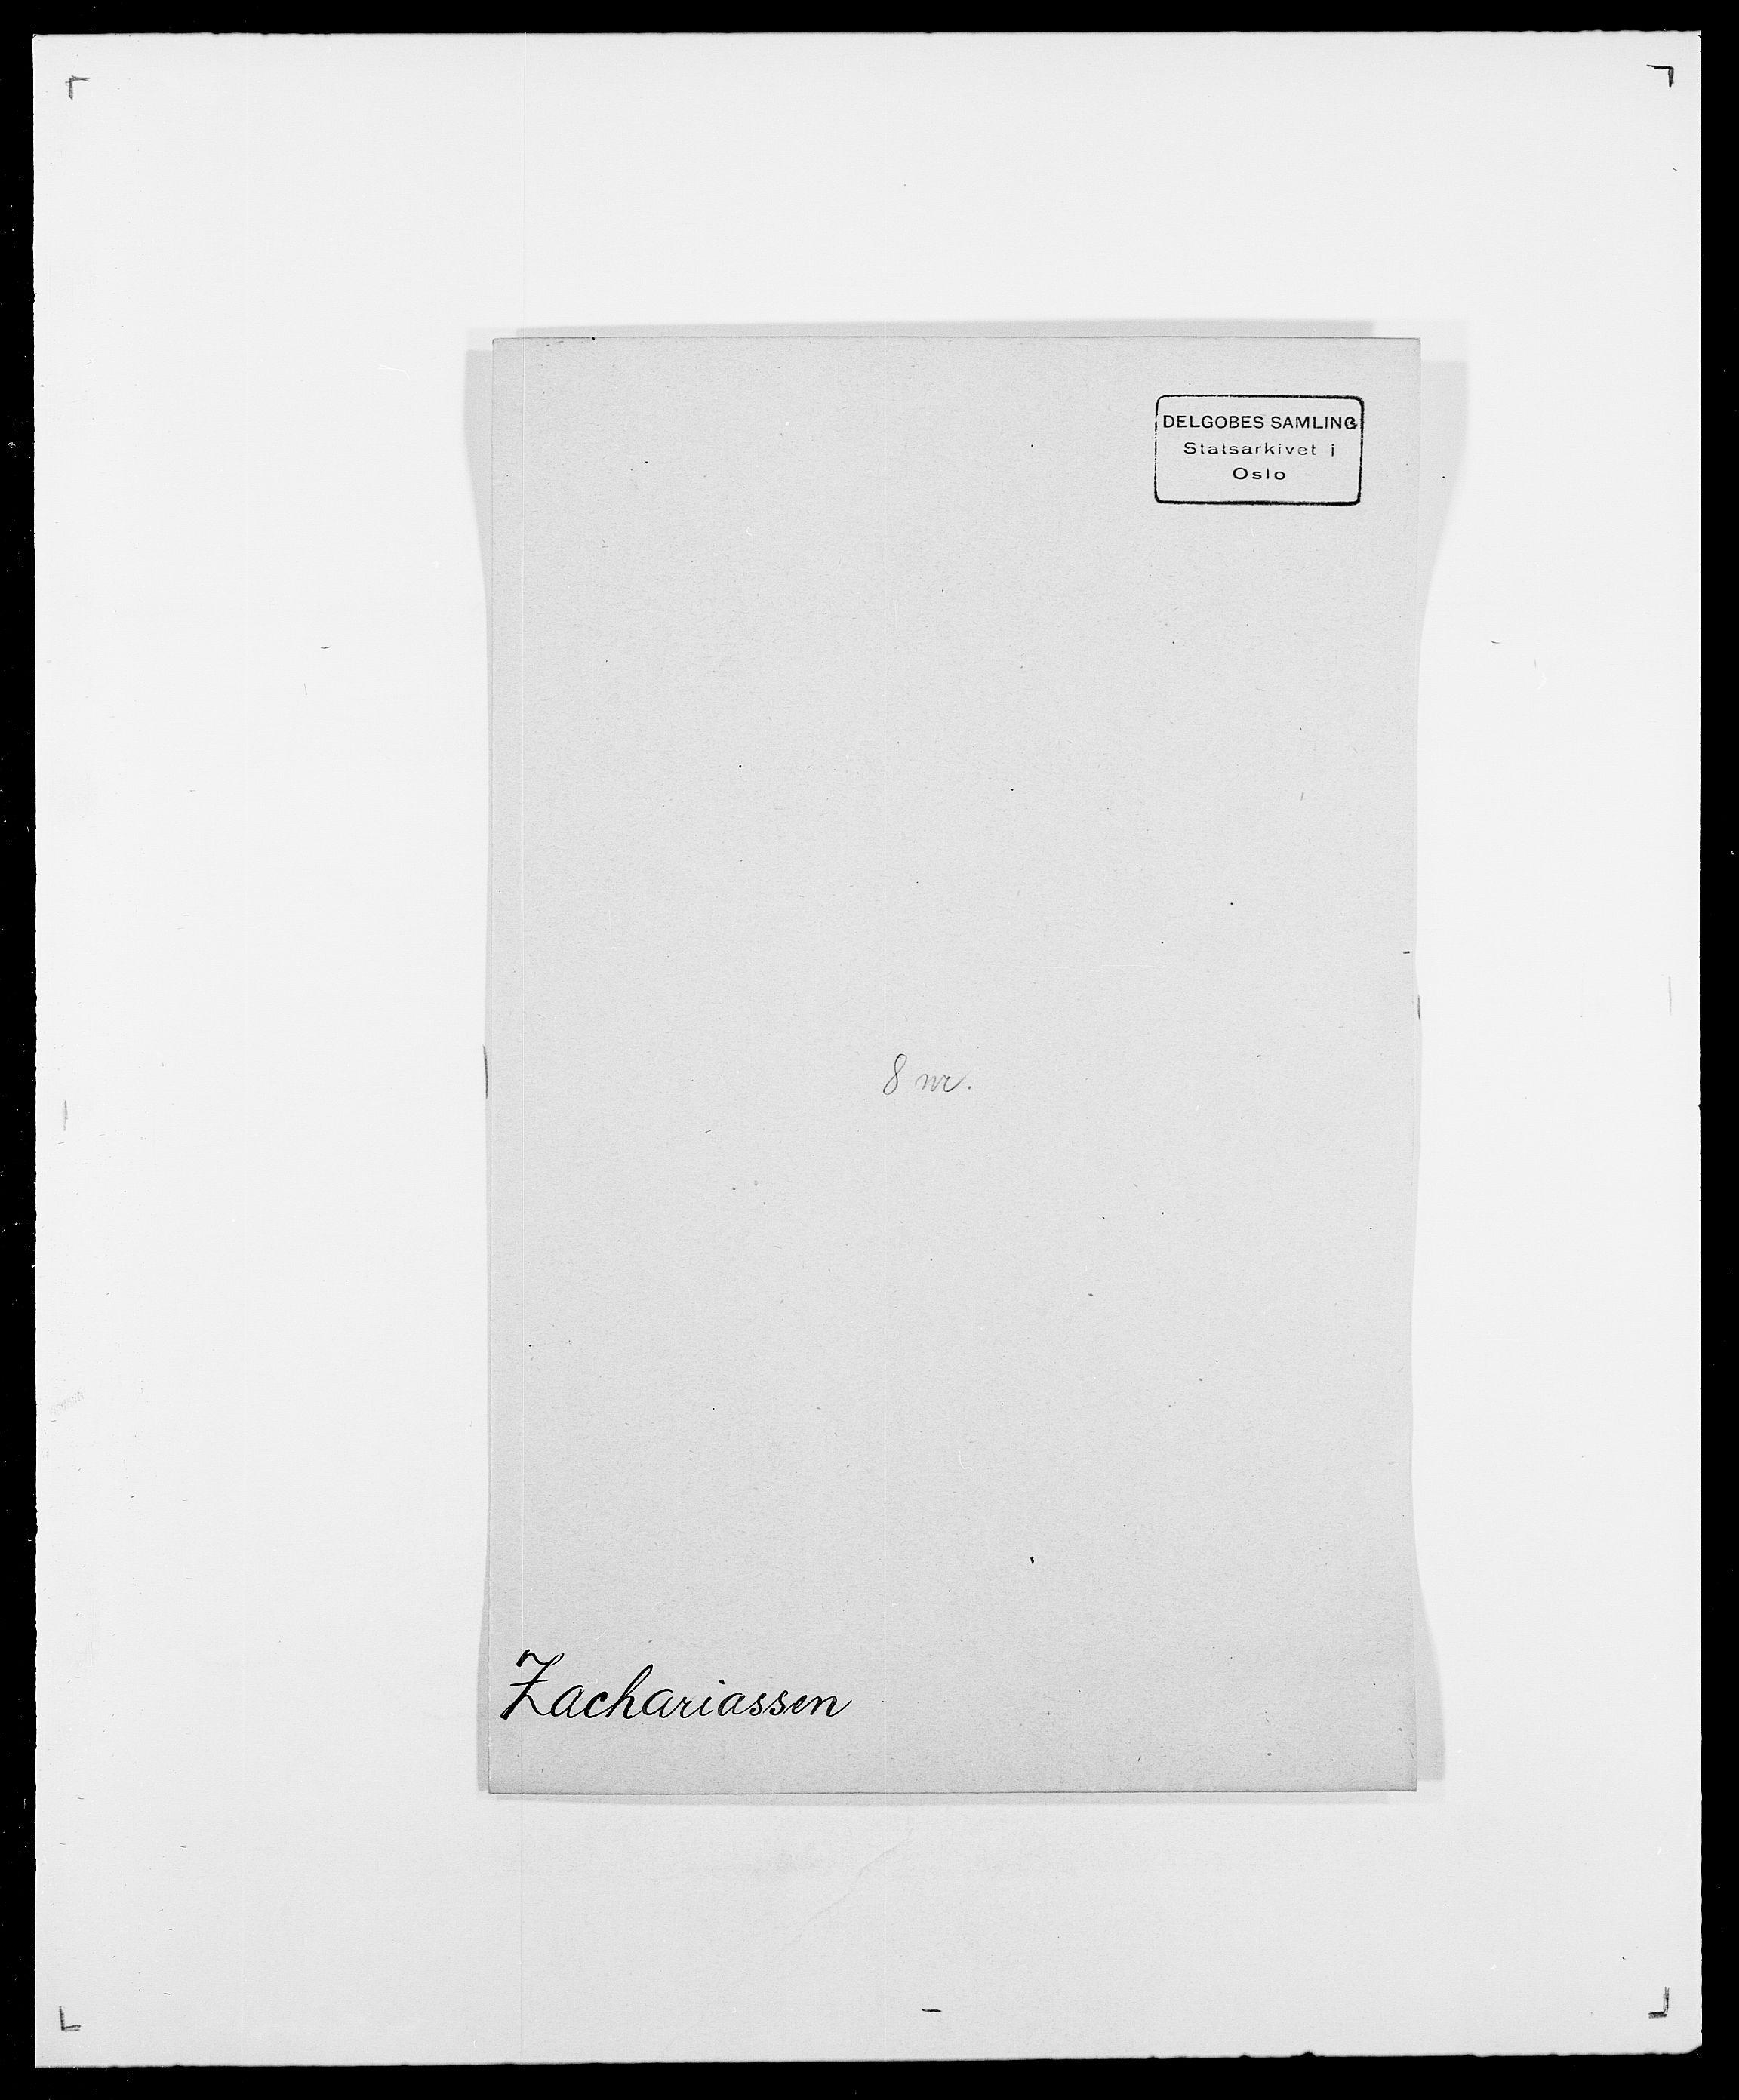 SAO, Delgobe, Charles Antoine - samling, D/Da/L0043: Wulfsberg - v. Zanten, s. 58